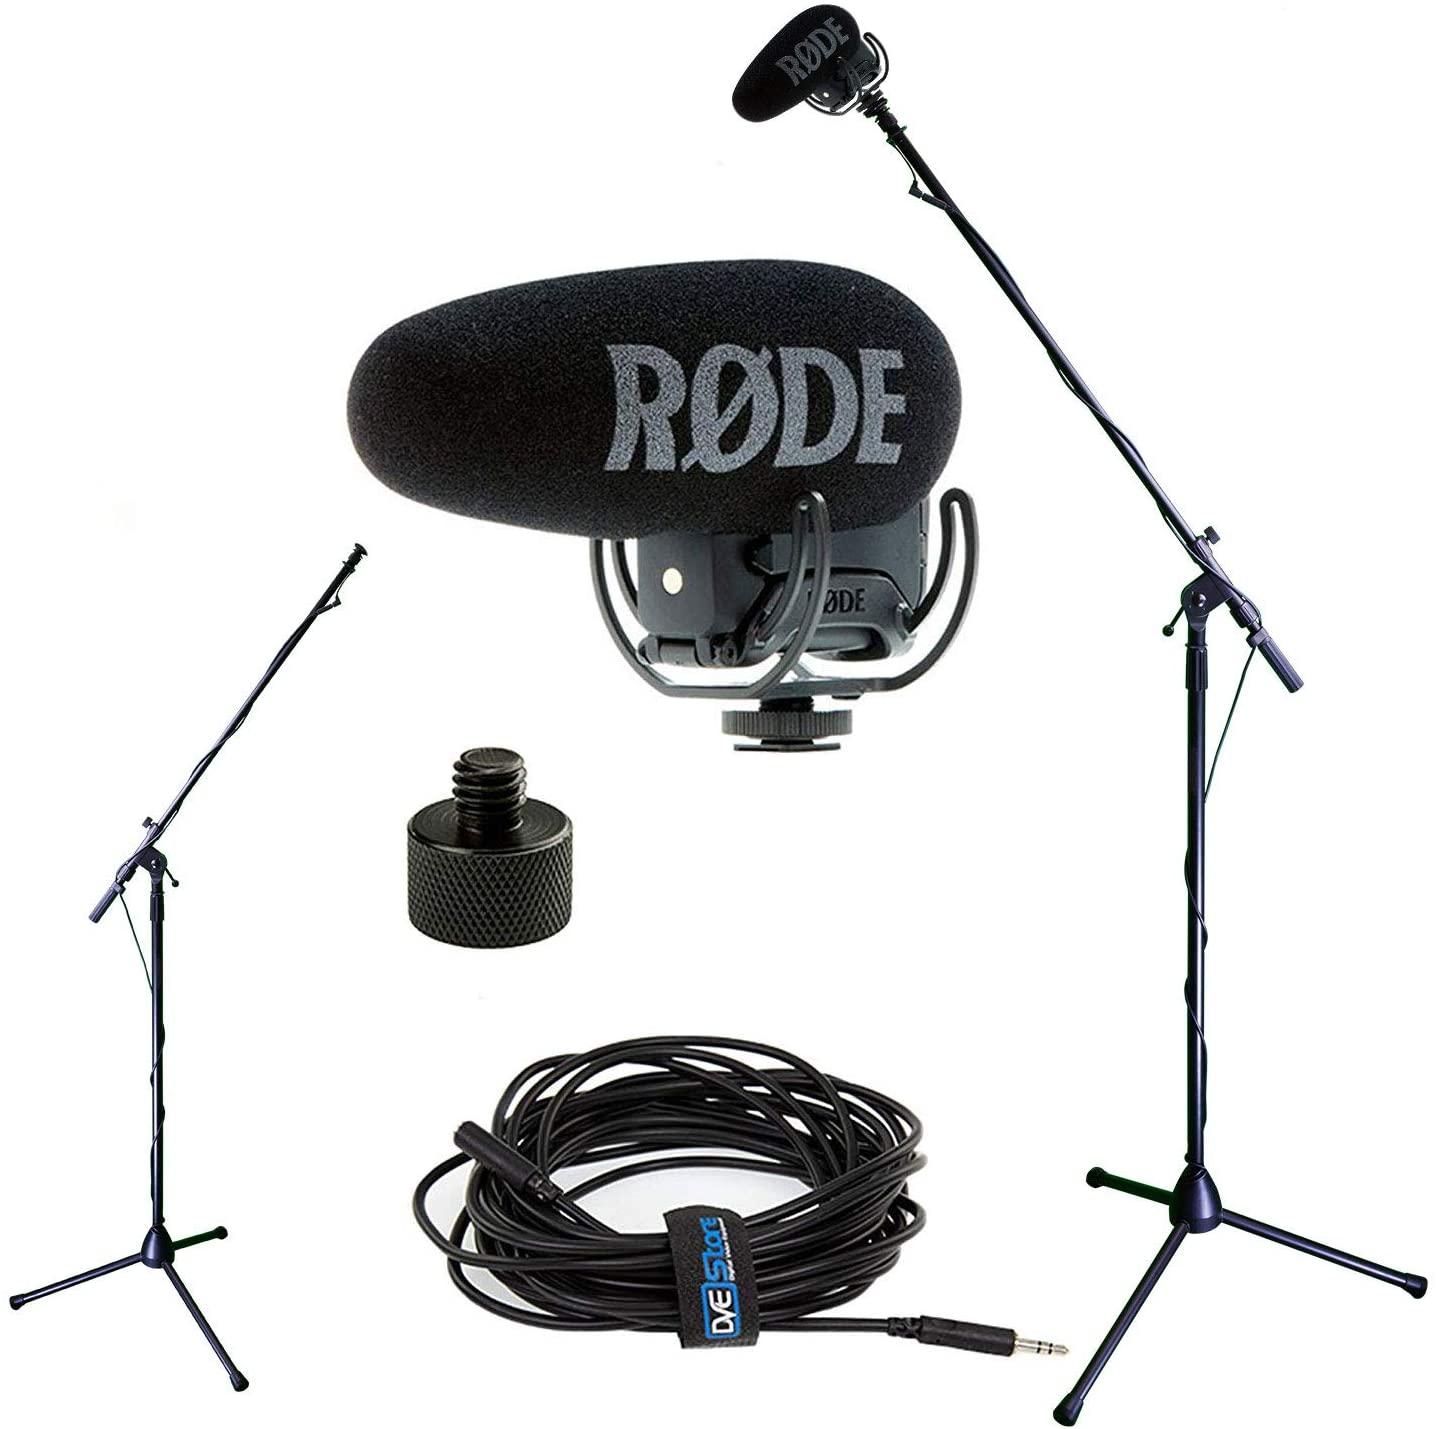 RODE Rycote Studio Boom Kit